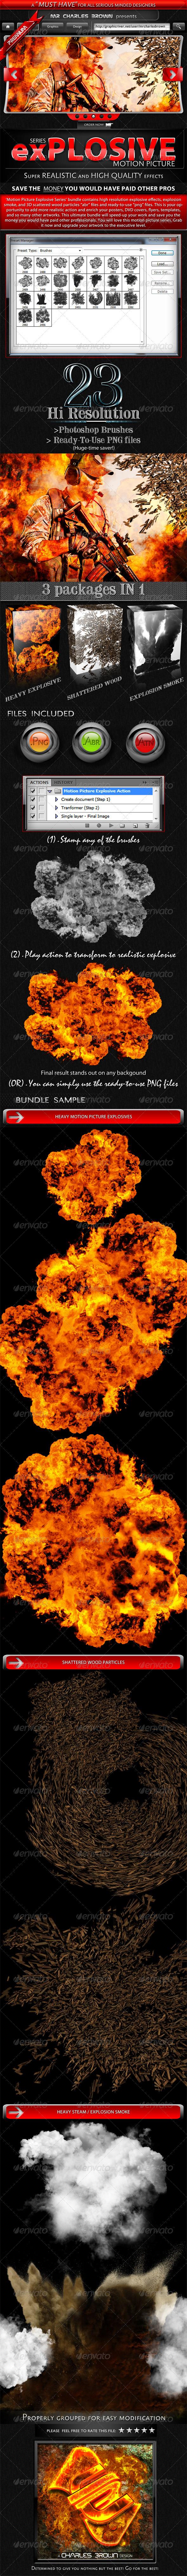 GraphicRiver Motion Picture Explosive Series 1176344